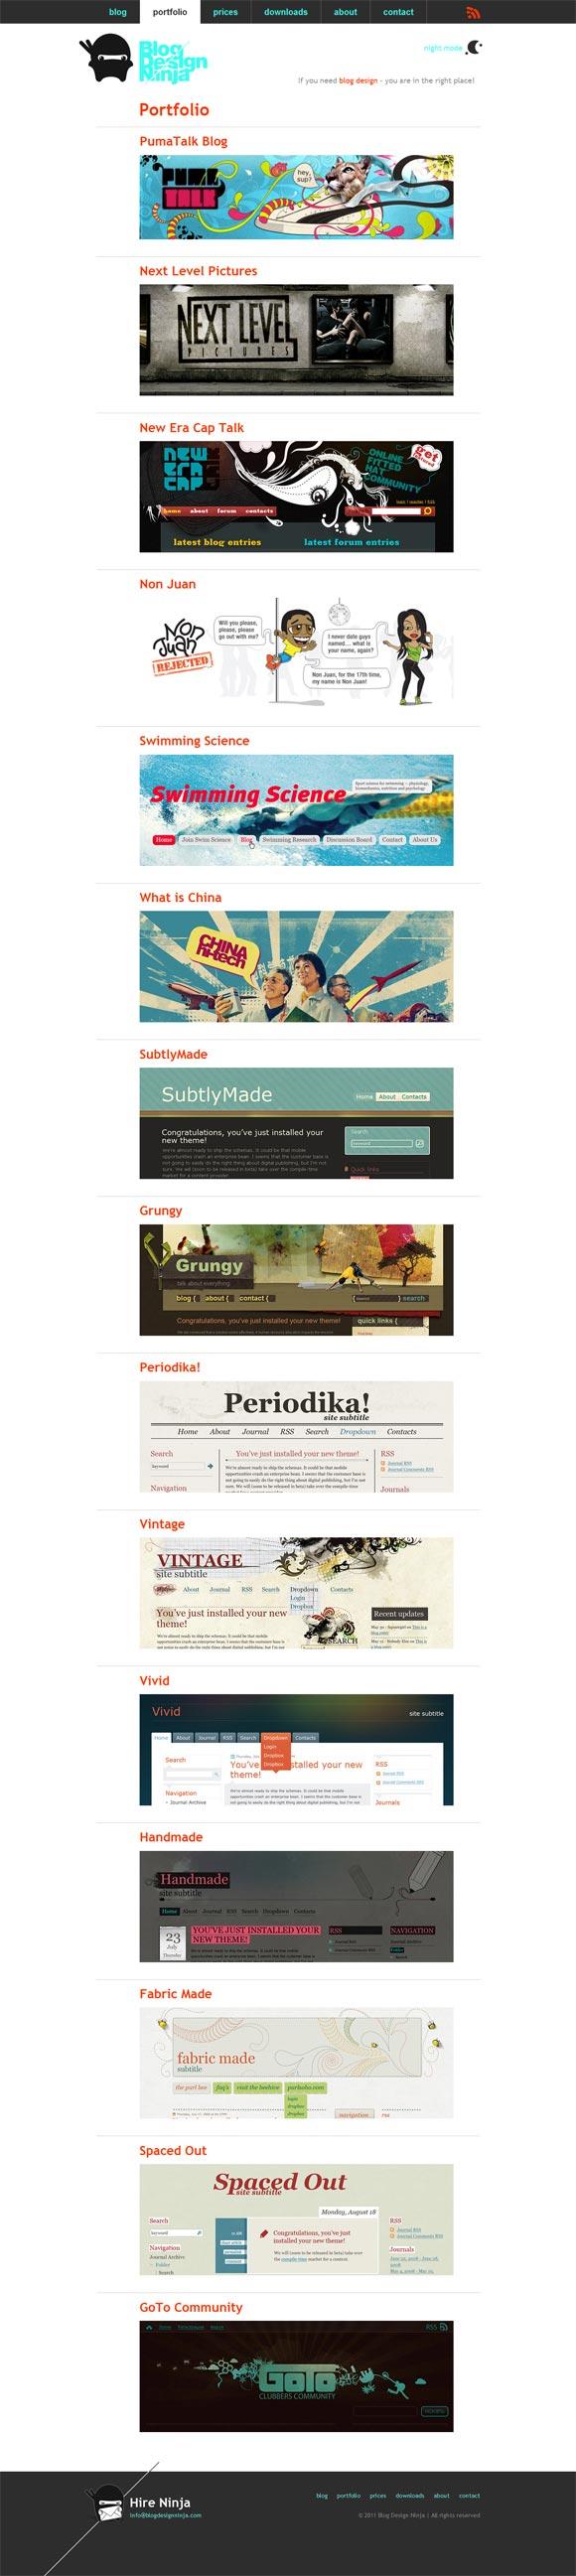 Blog Design Ninja | Web Design